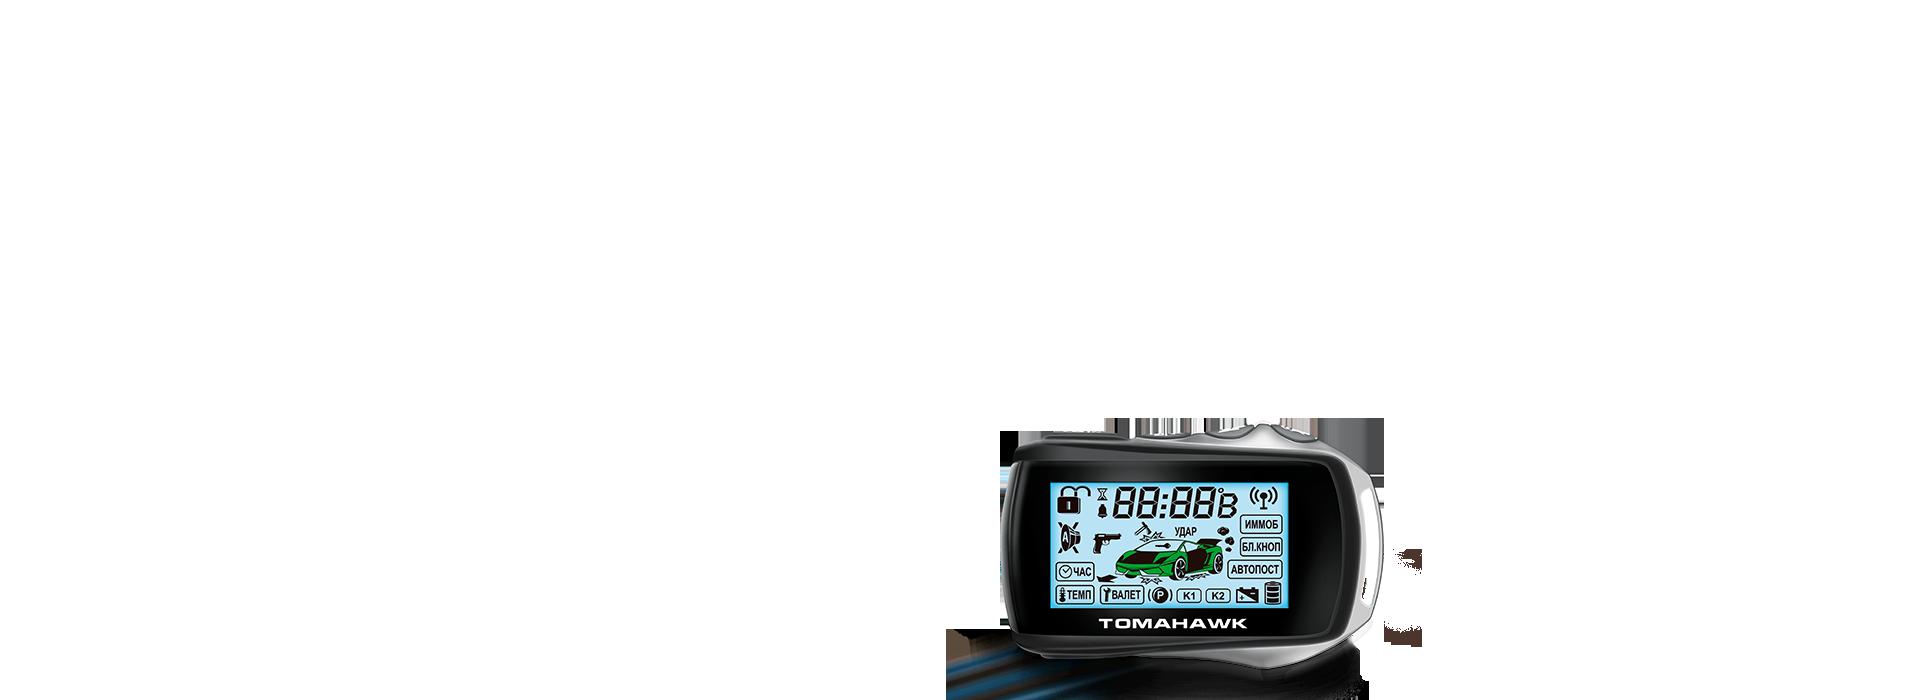 TOMAHAWK G-9000